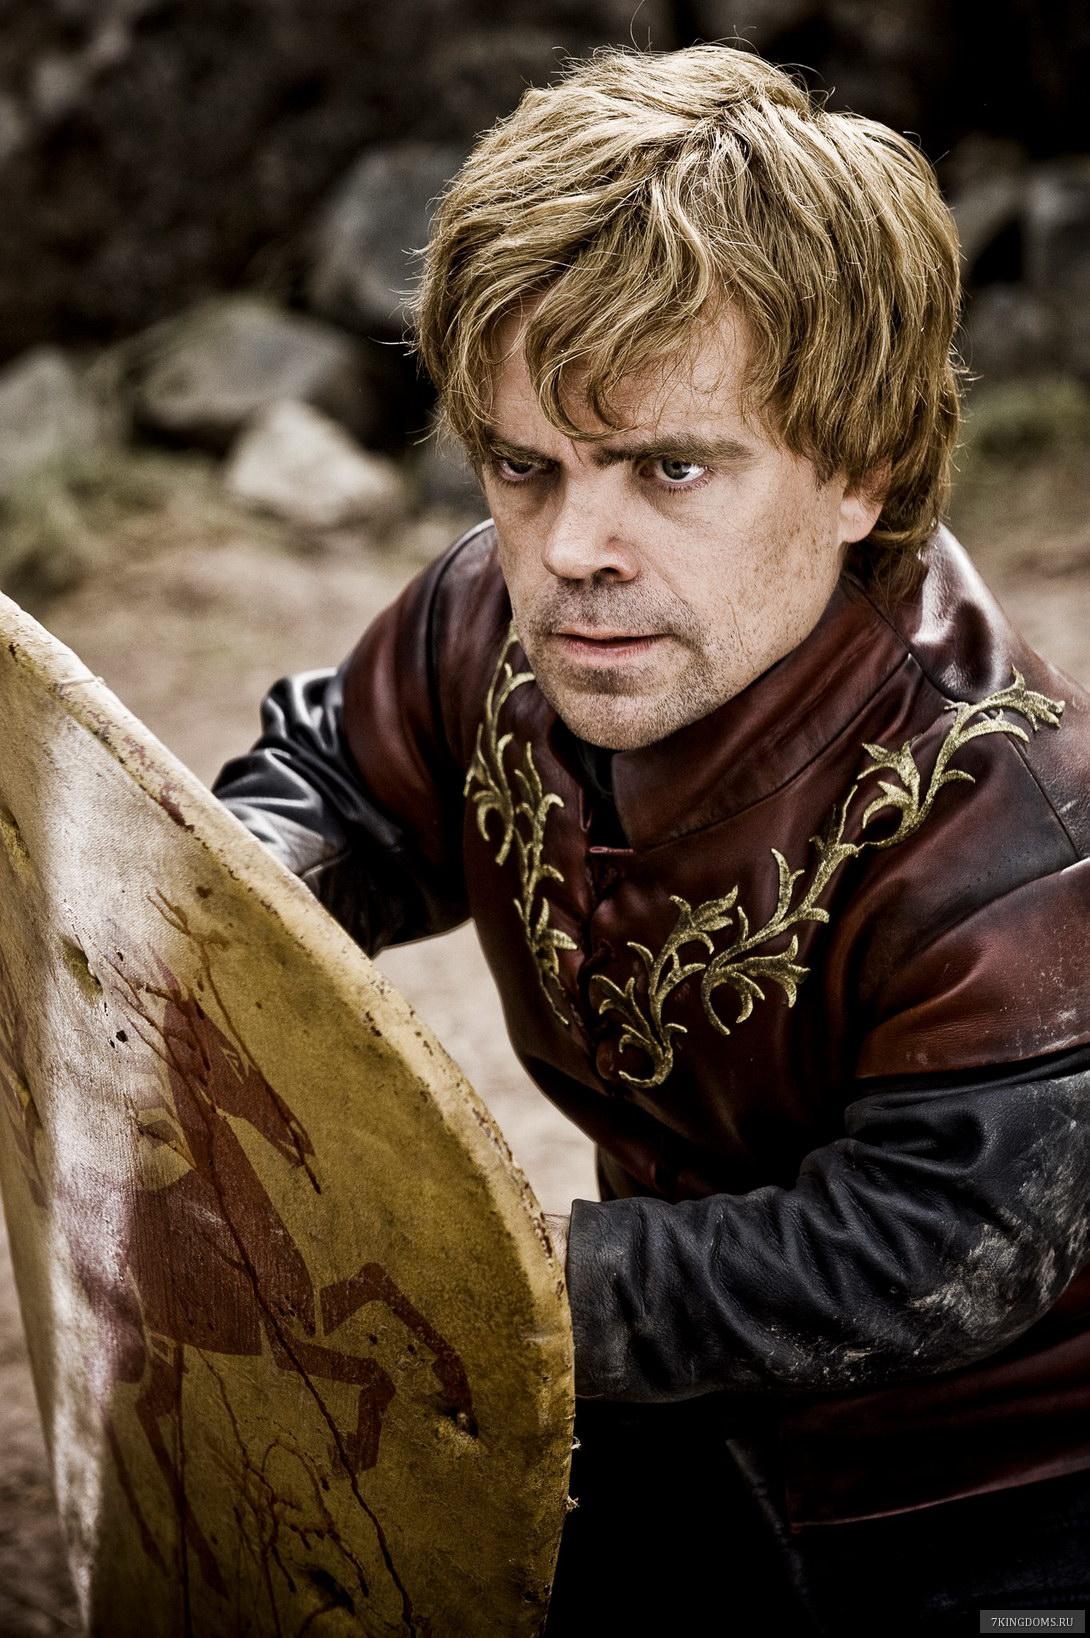 http://images5.fanpop.com/image/photos/24500000/Tyrion-Lannister-house-lannister-24542029-1090-1638.jpg